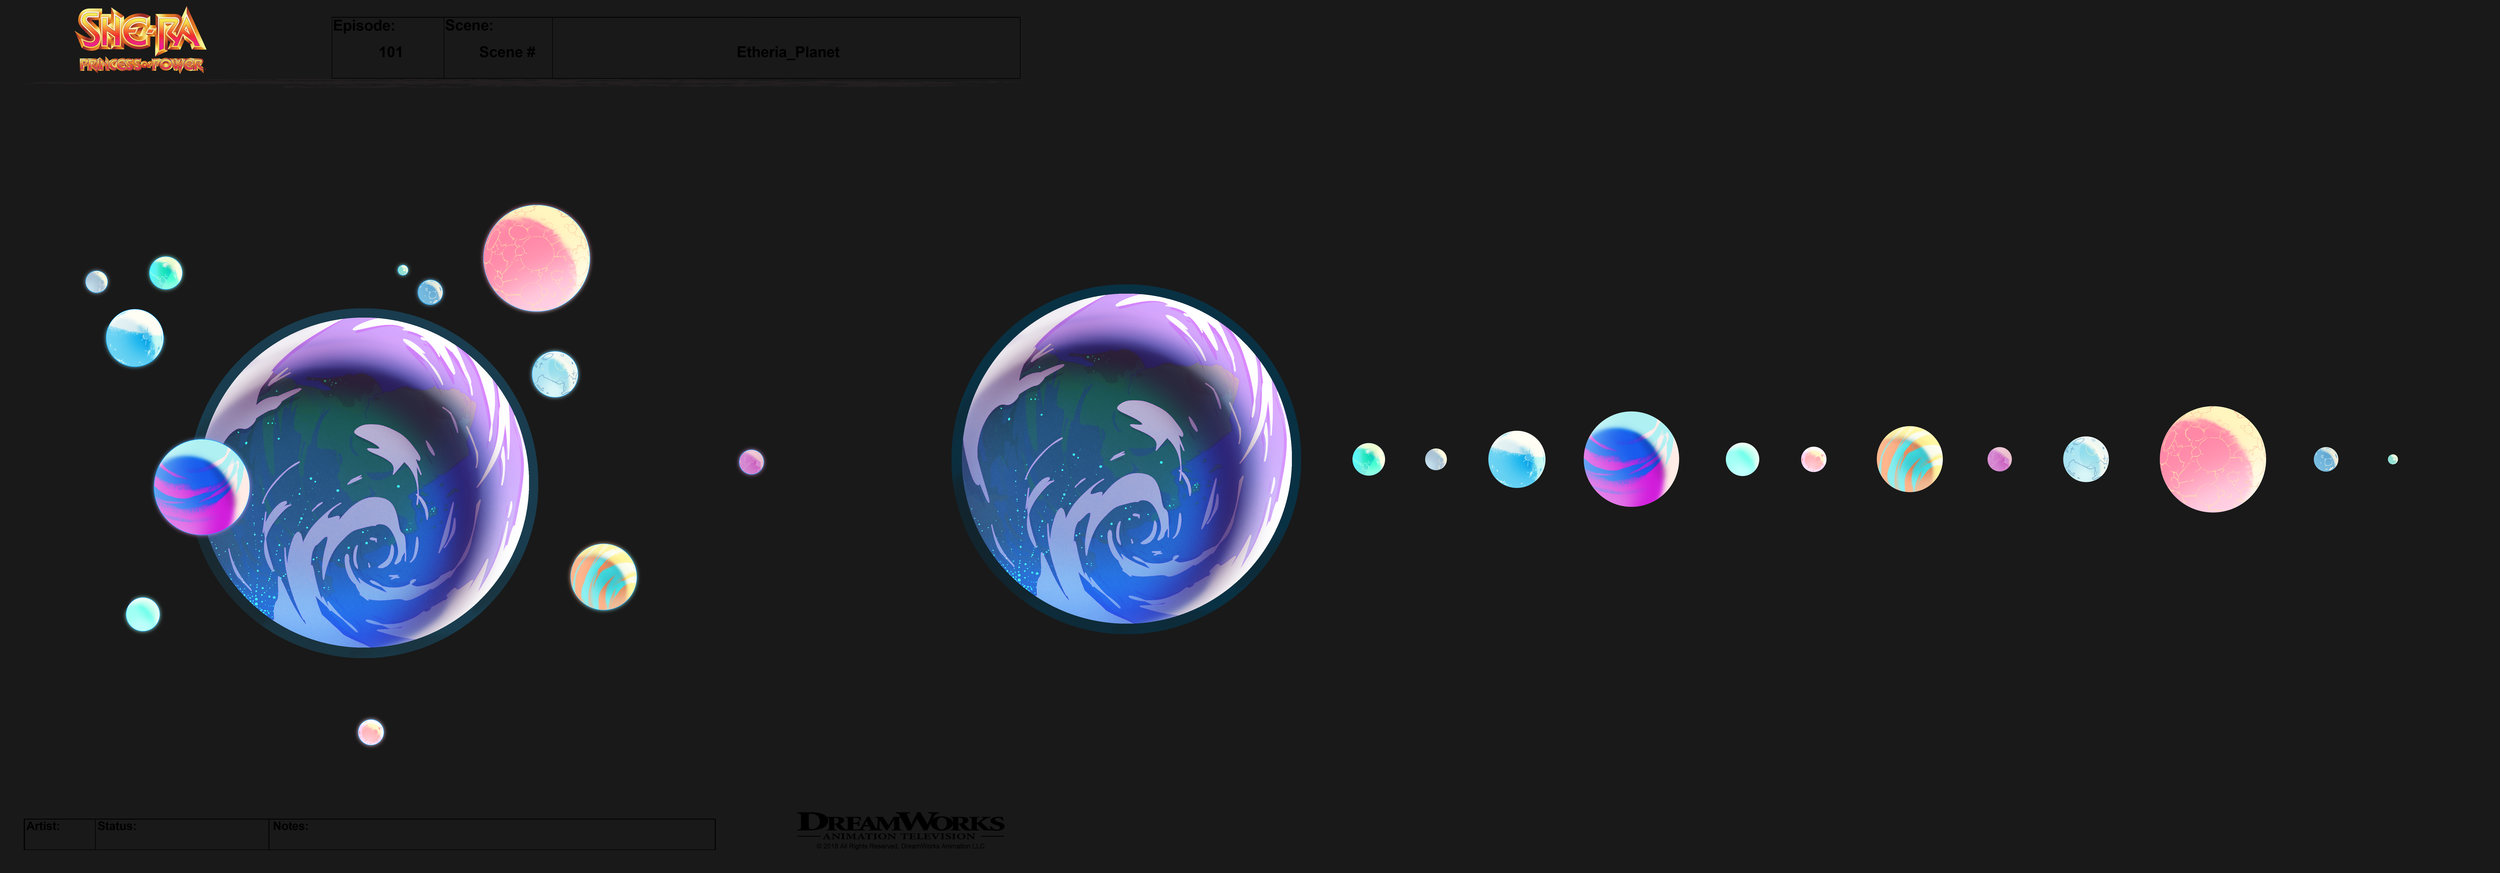 SHE101_Etheria_Planet_RUF_v004a_GK.jpg